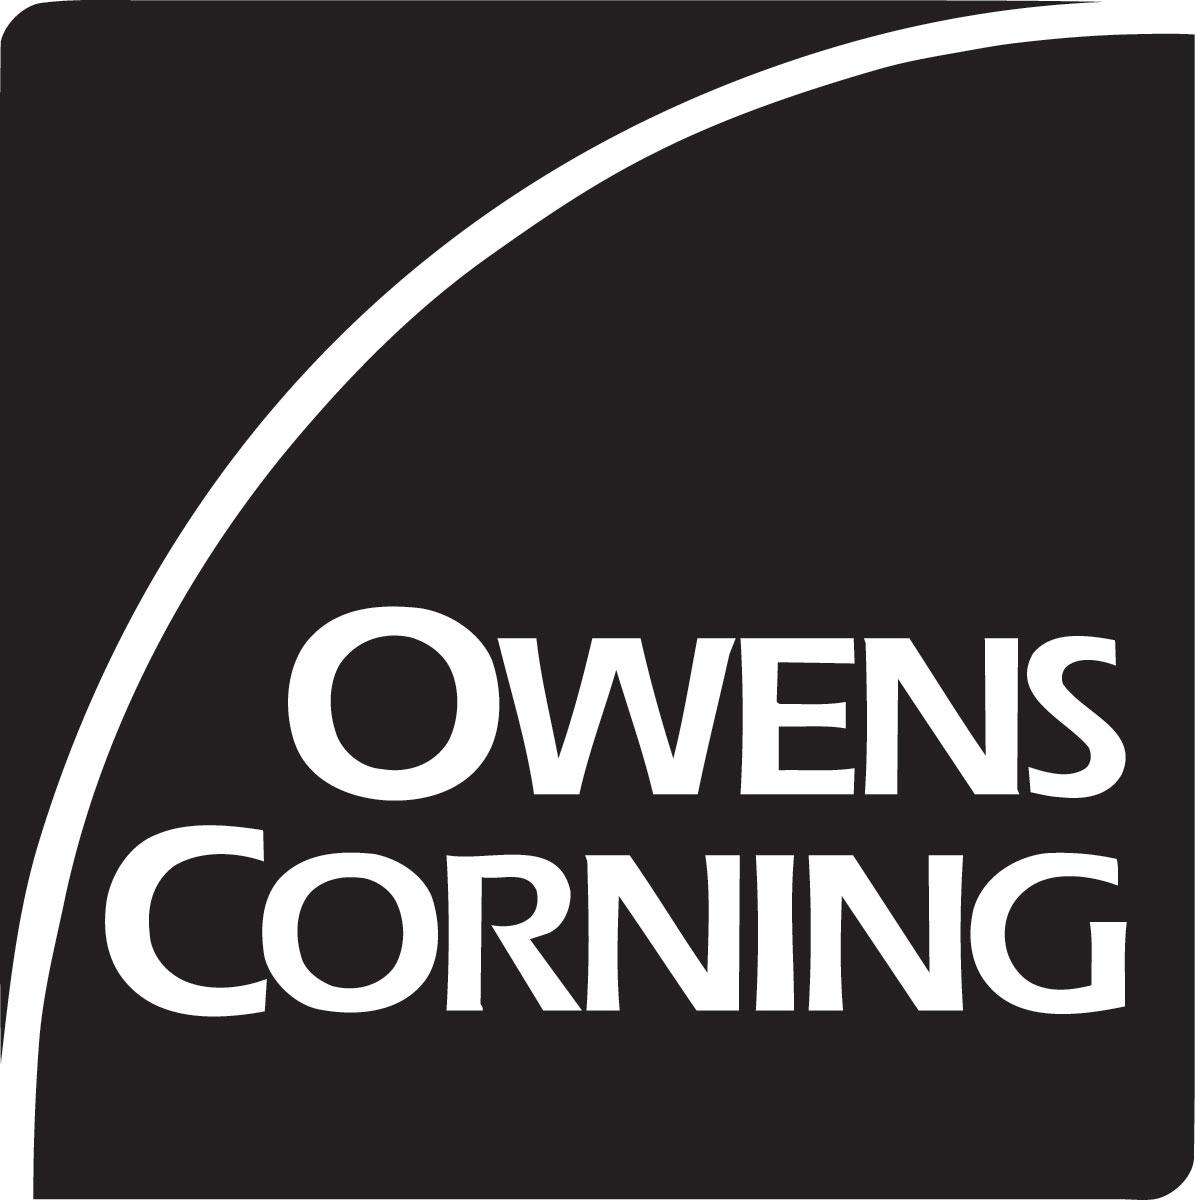 Owens Corning - Oreland Roofing